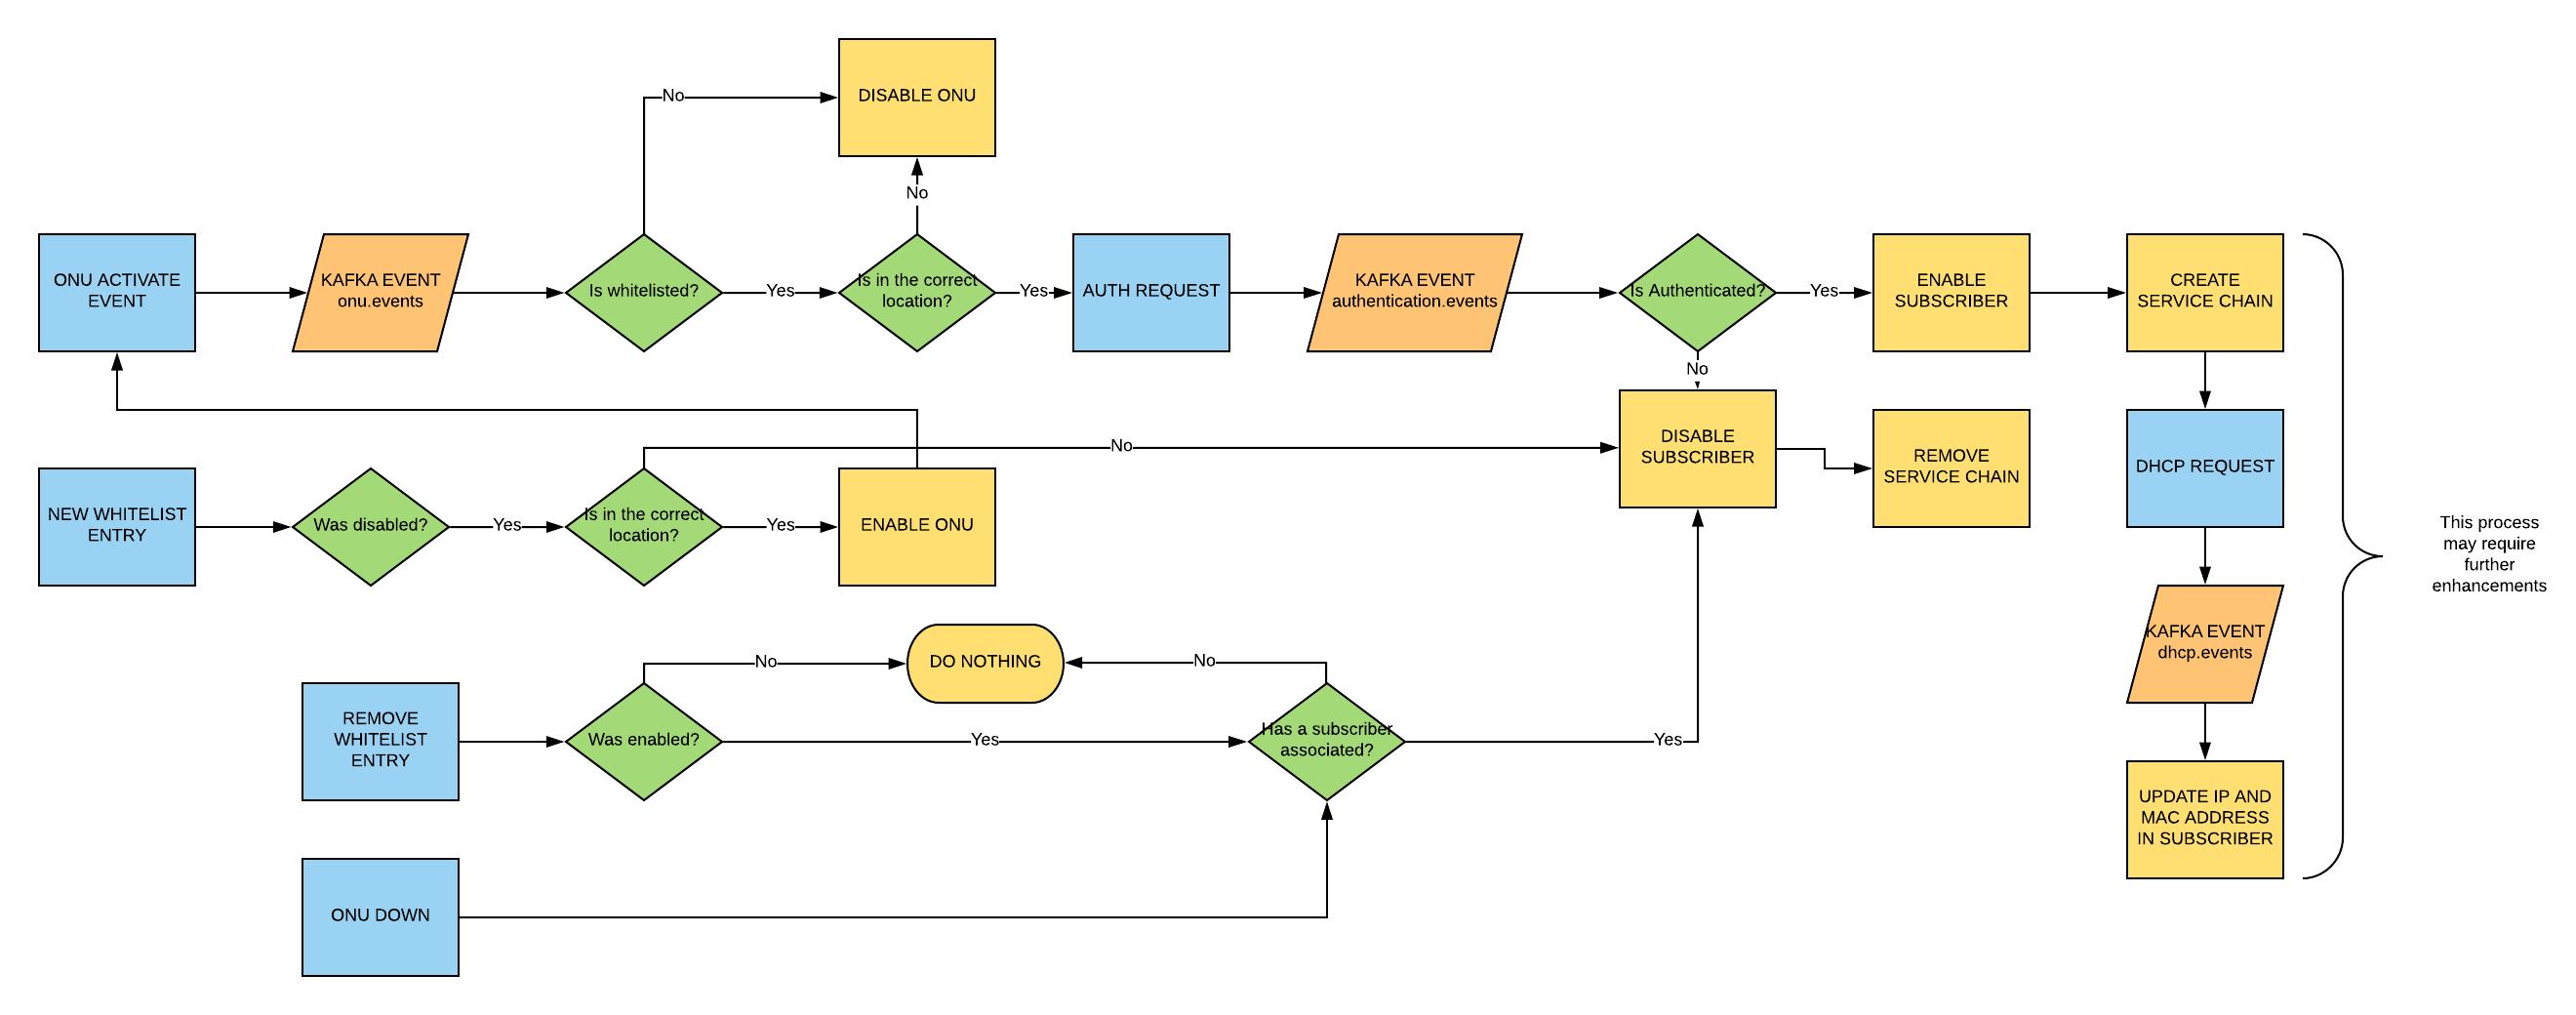 AT&T workflow description · CORD Guide